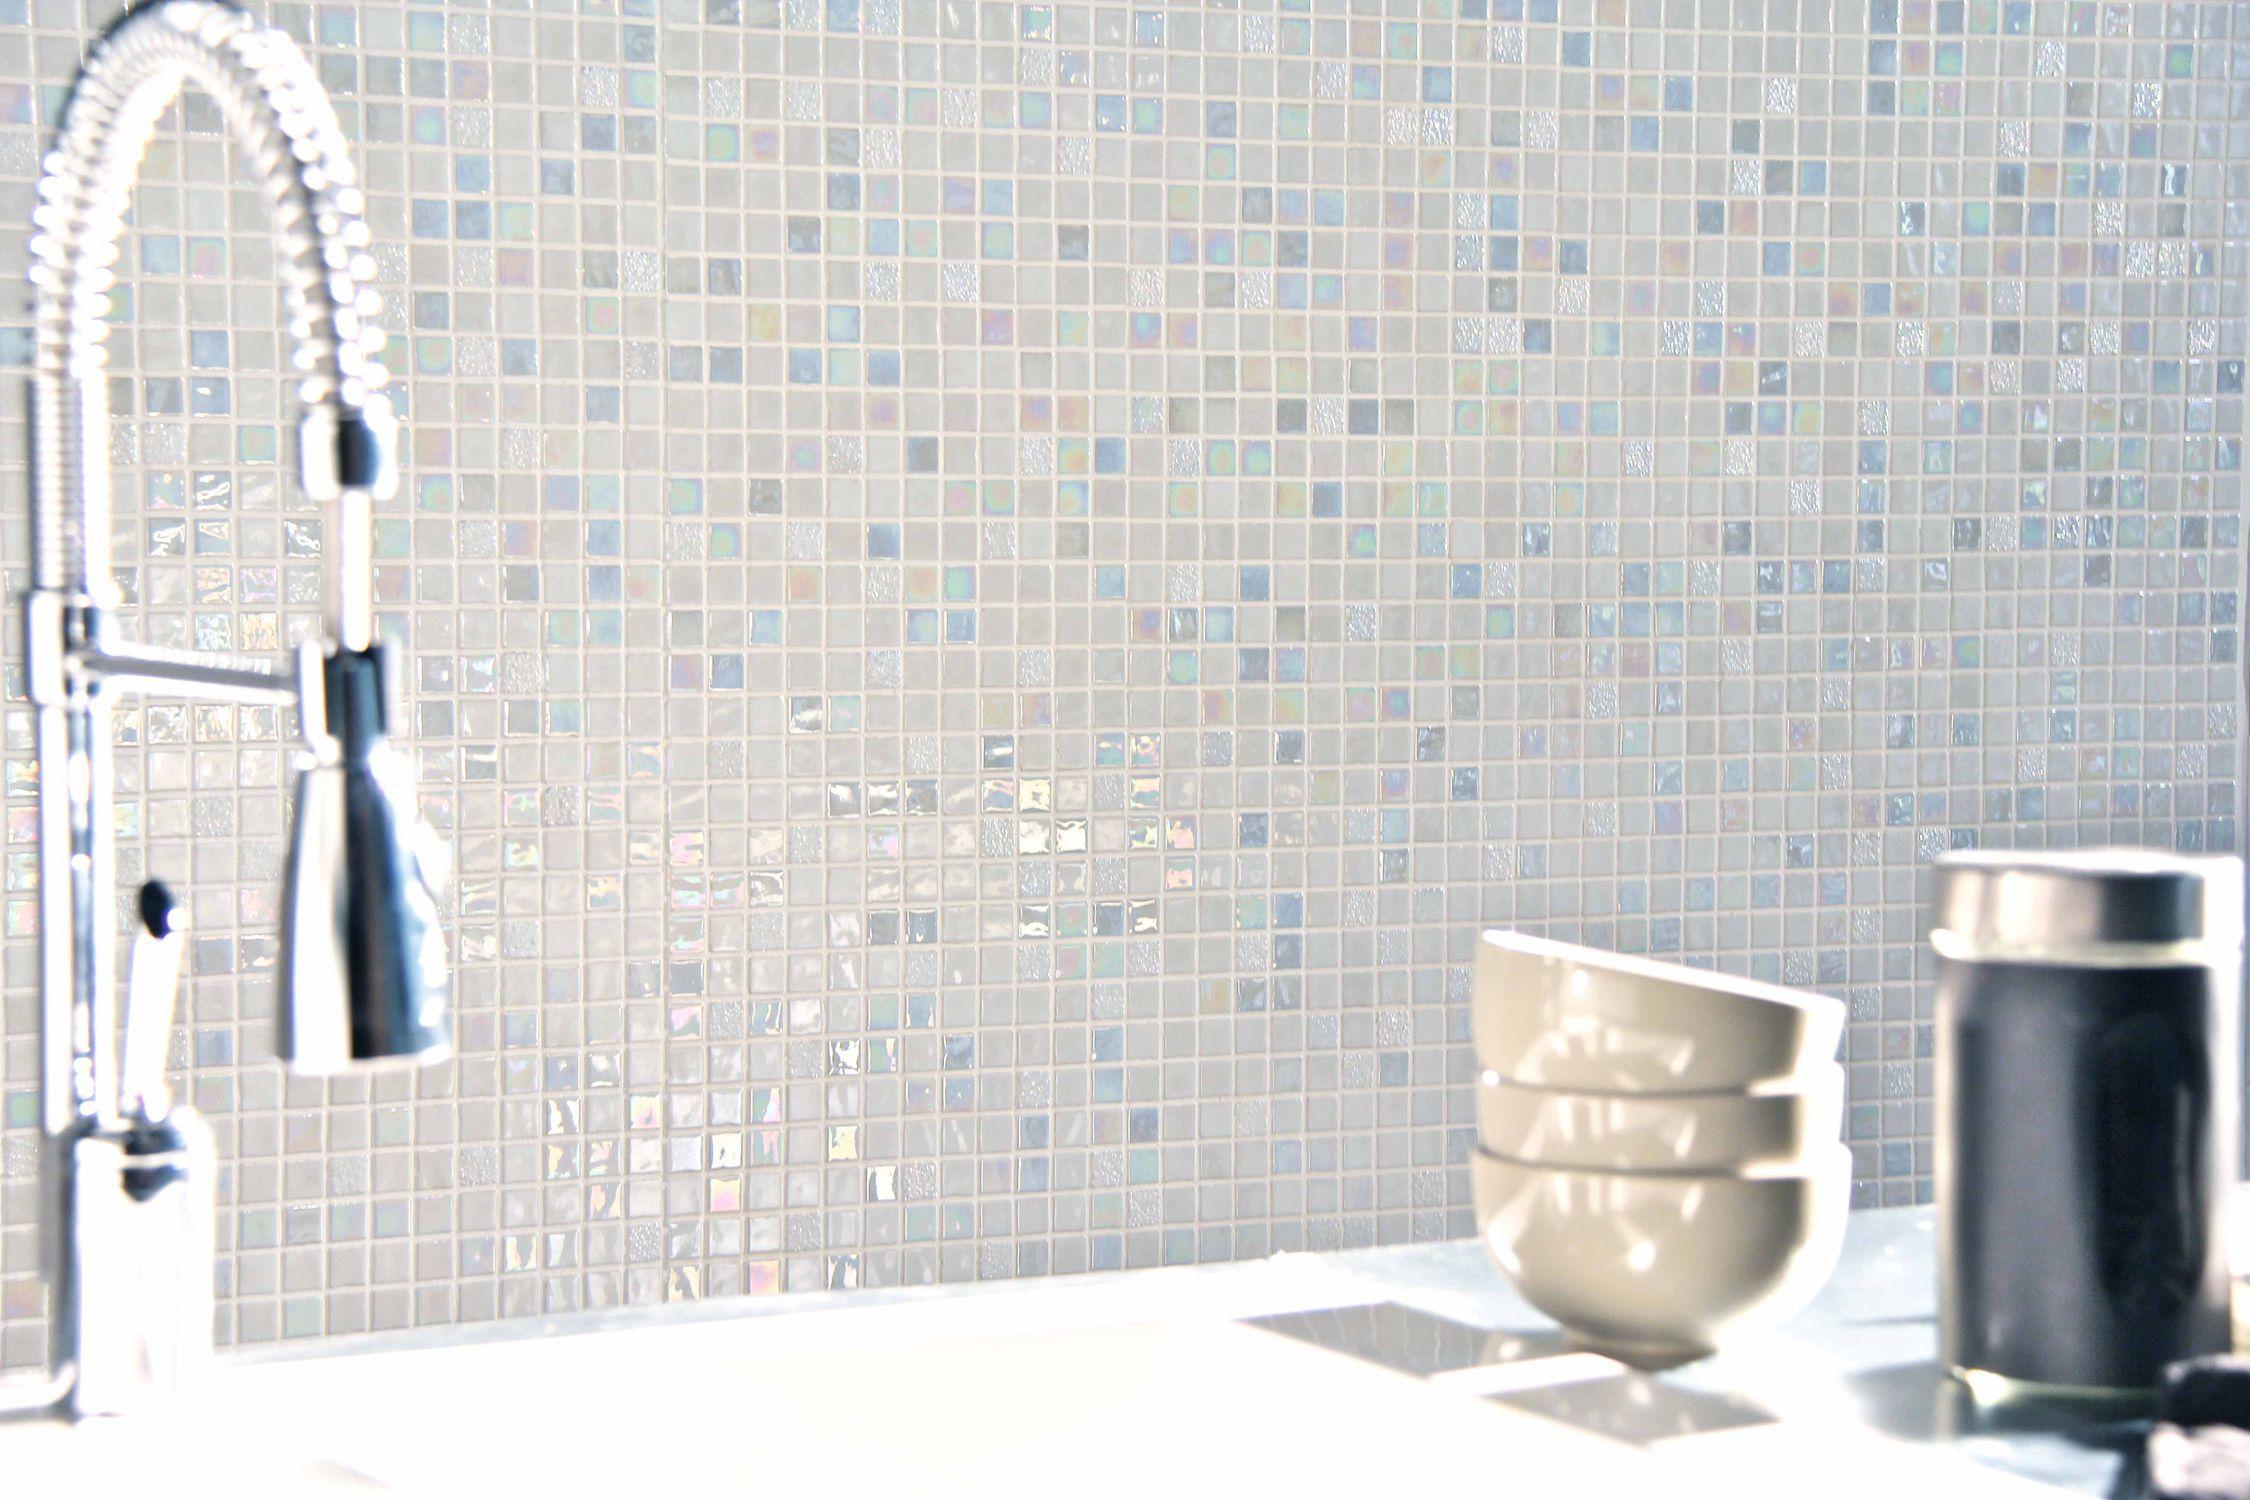 mosaque de salle de bain murale en verre blanche